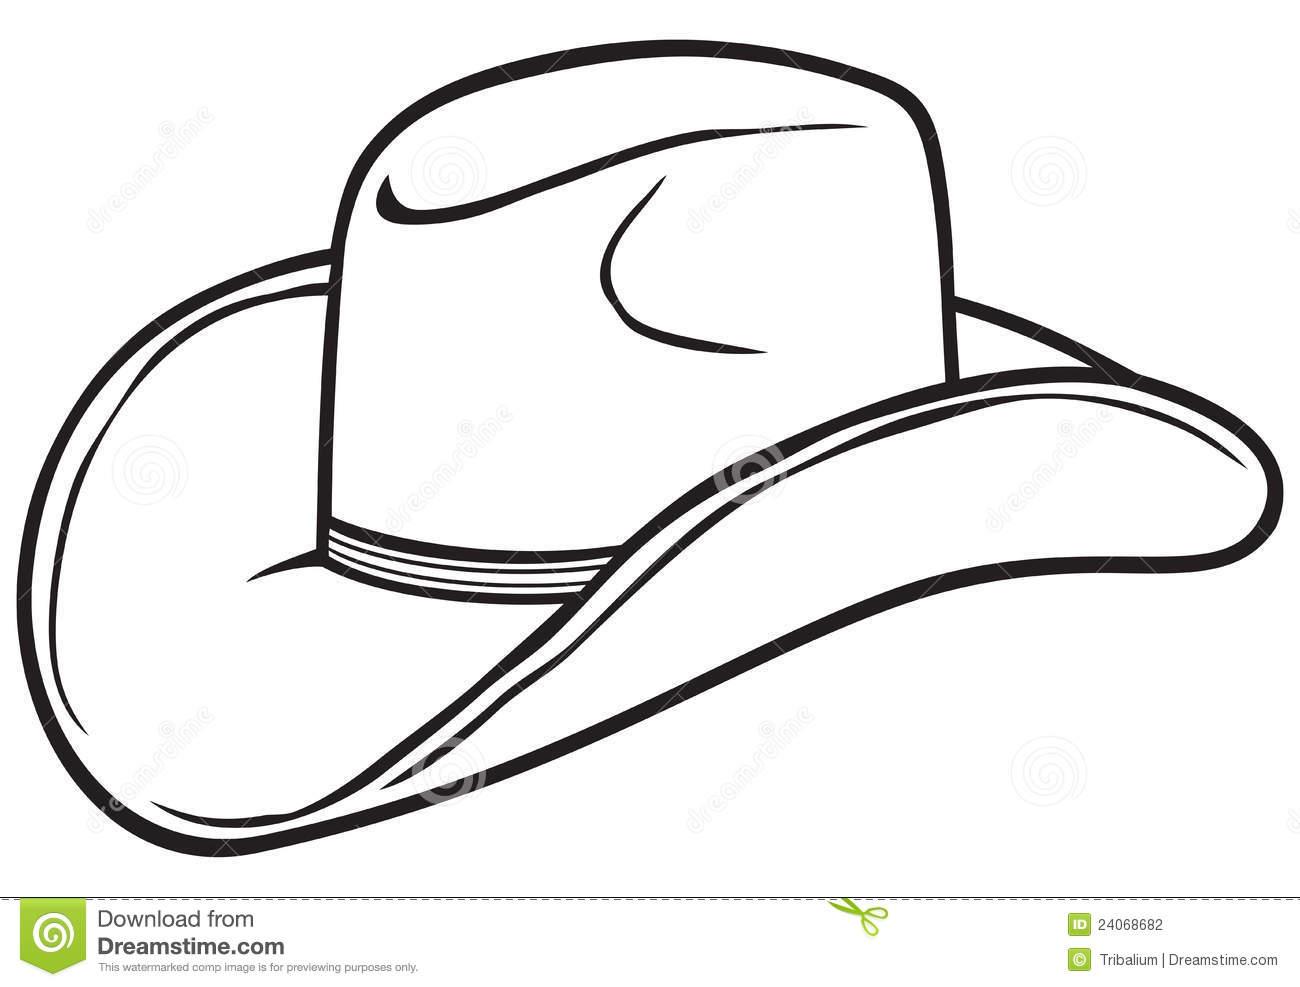 cowboy hat a symbol that clipart panda free clipart images rh clipartpanda com Cowboy Hat Background Vintage Cowboy Clip Art